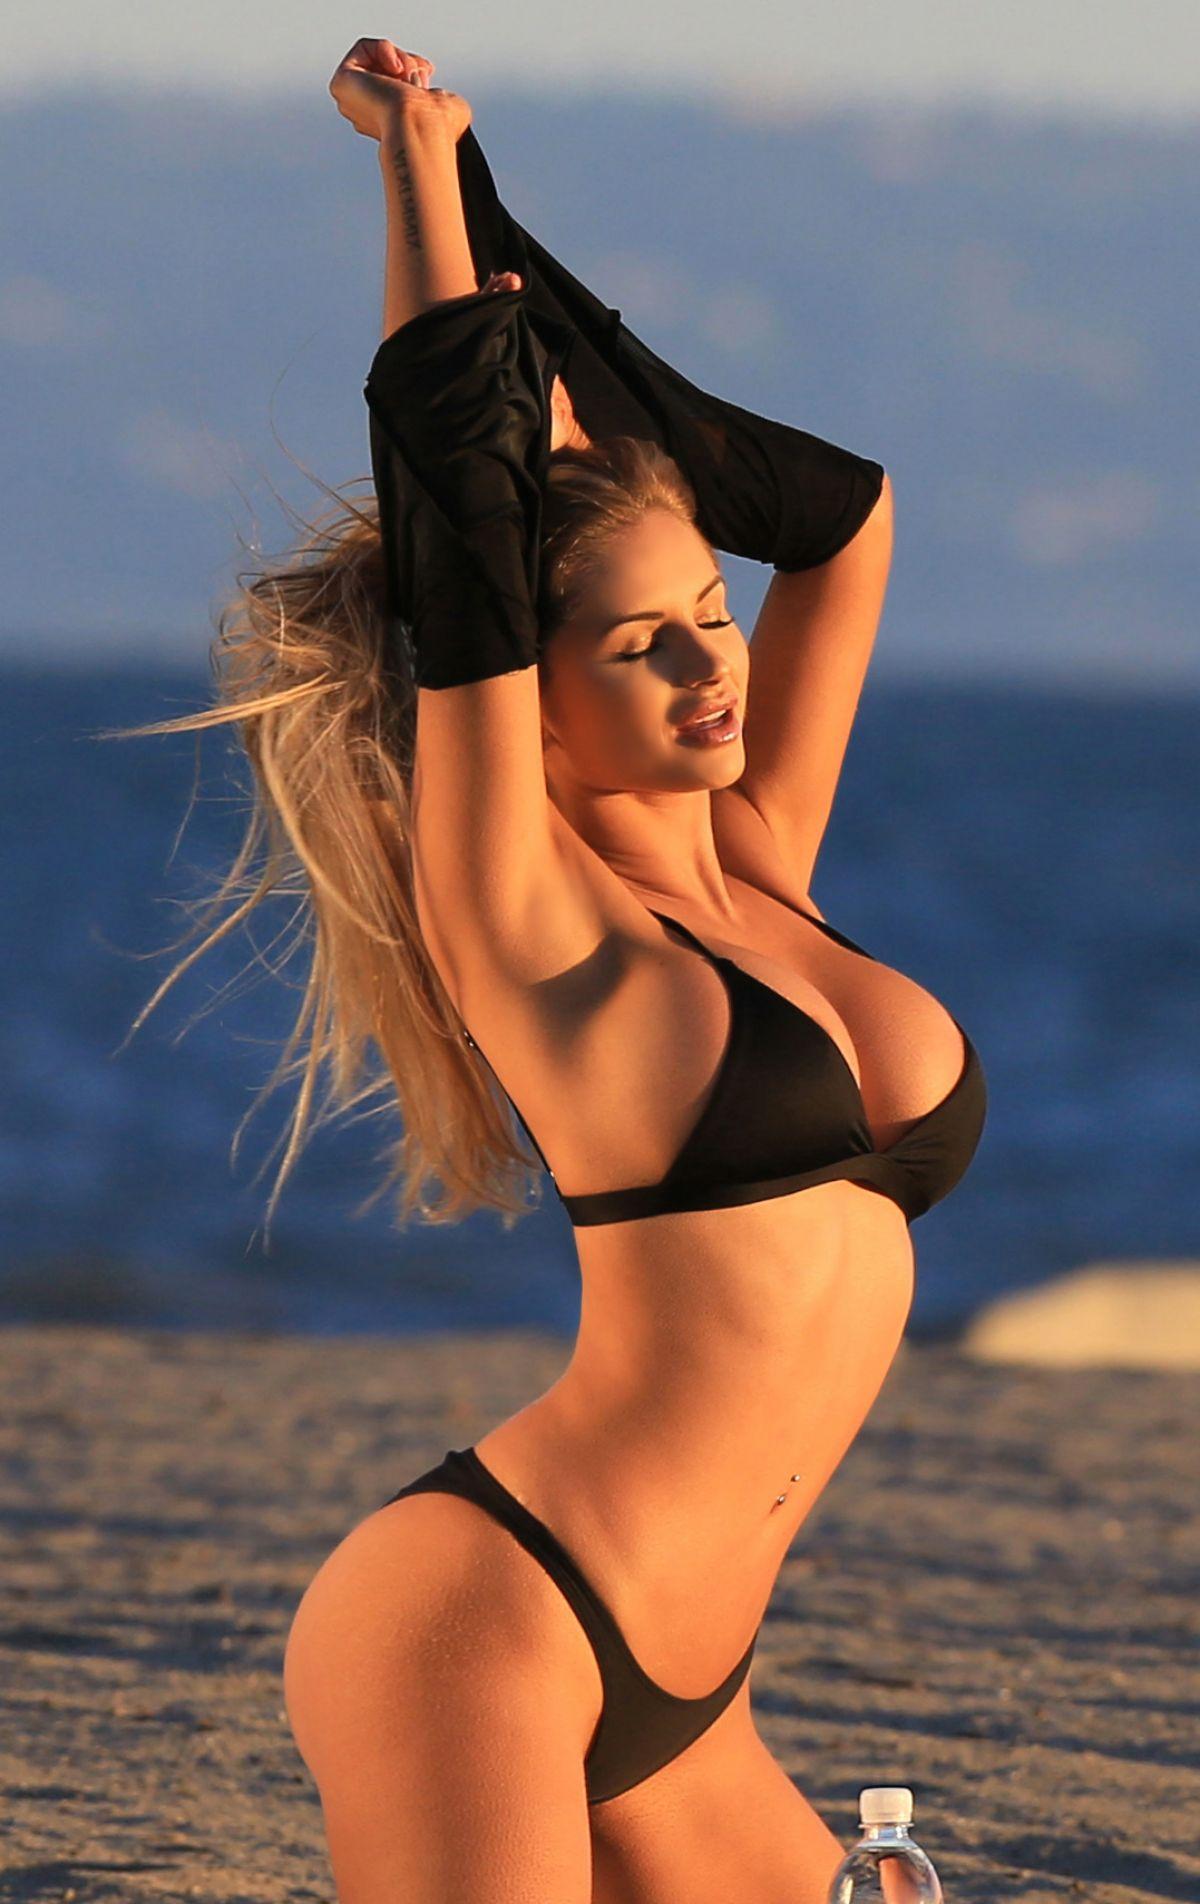 AMY LEE SUMMERS in Bikini for 138 Water Photoshoot in Laguna Beach 03/09/2017